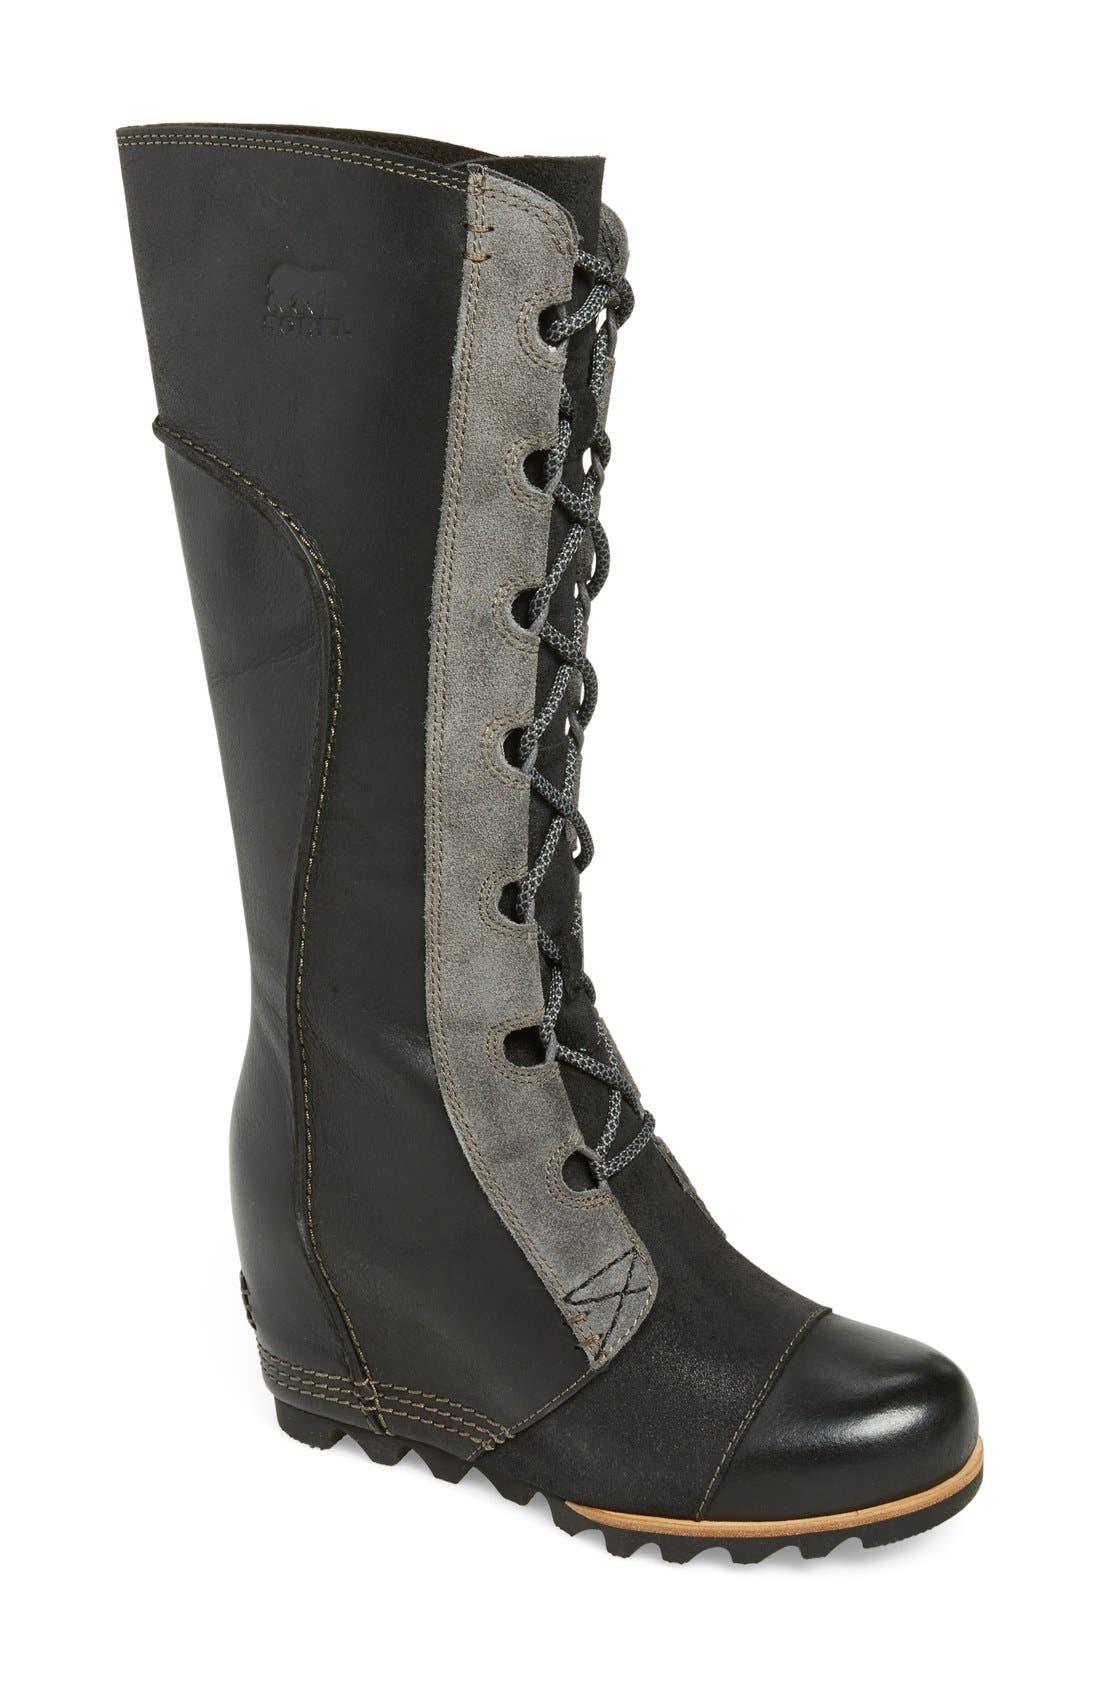 Main Image - SOREL 'Cate the Great' Waterproof Wedge Boot (Women)